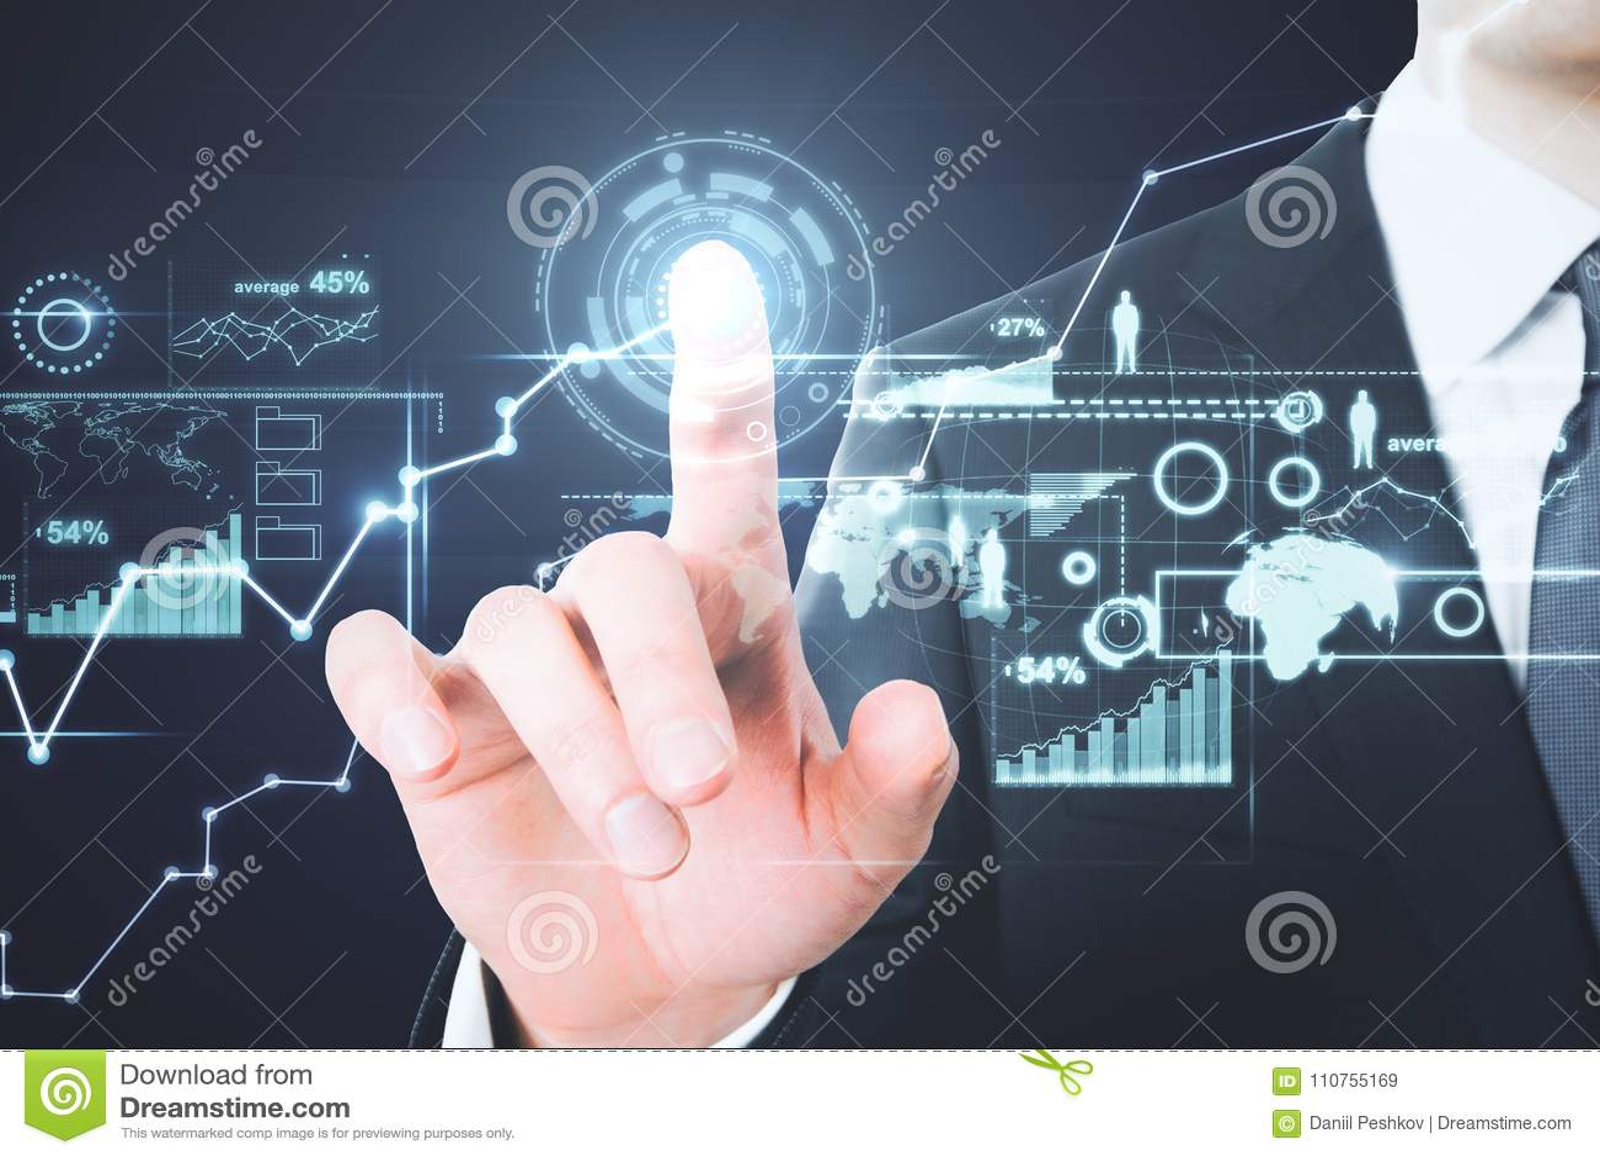 Future and analytics concept